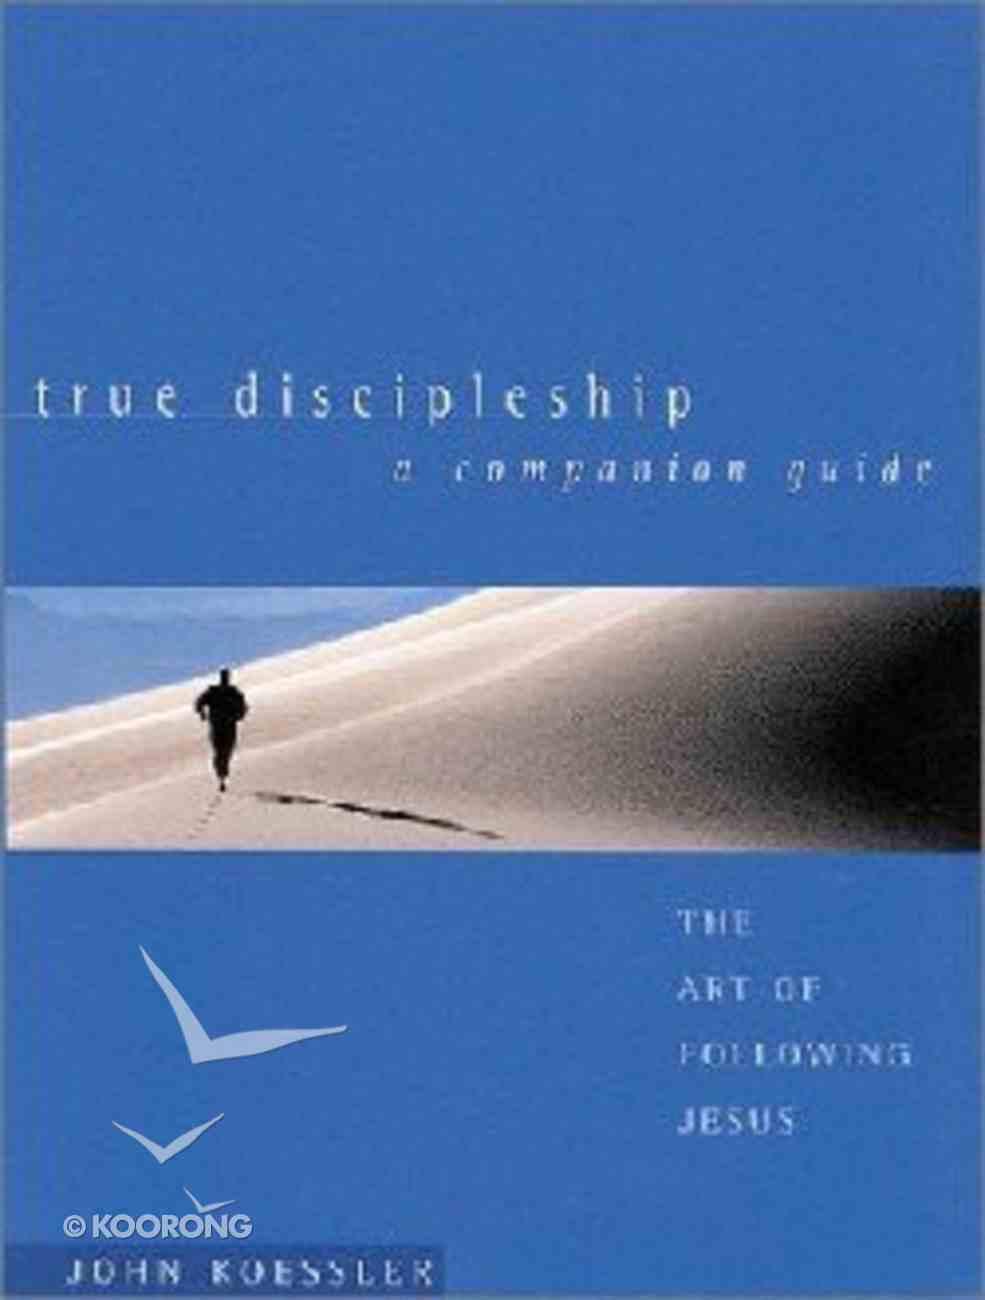 True Discipleship (A Companion Guide) Paperback